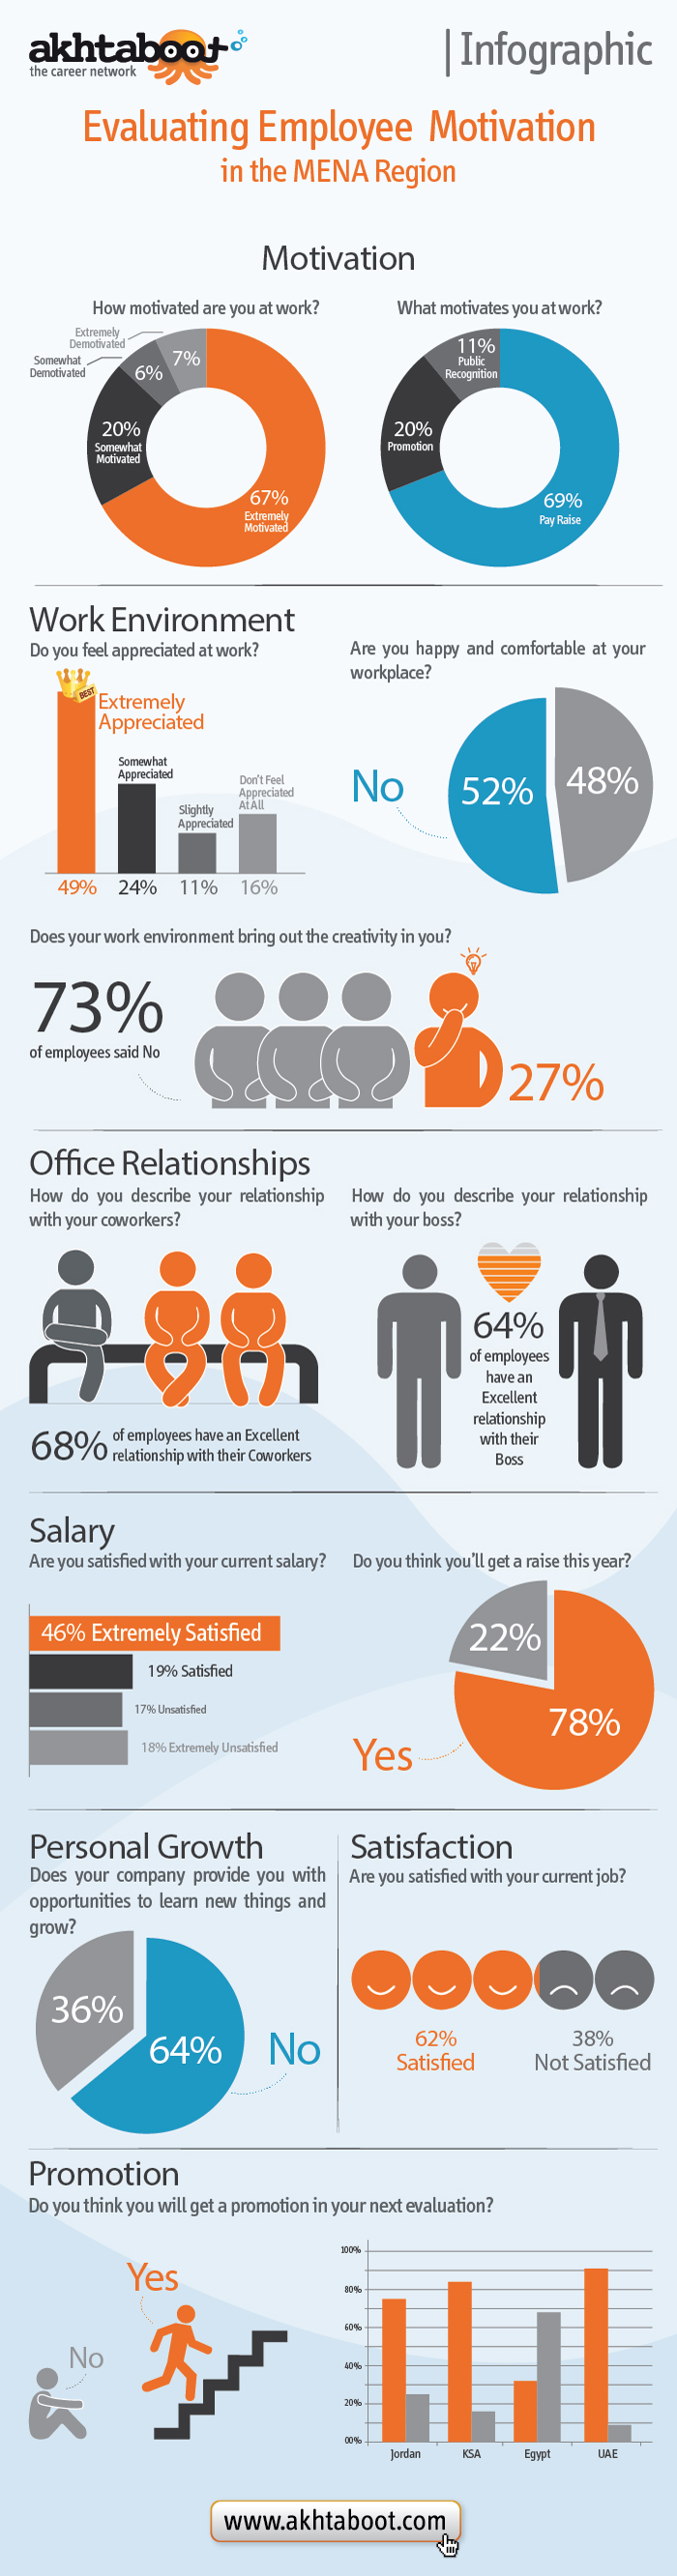 infographic_2013-Q2